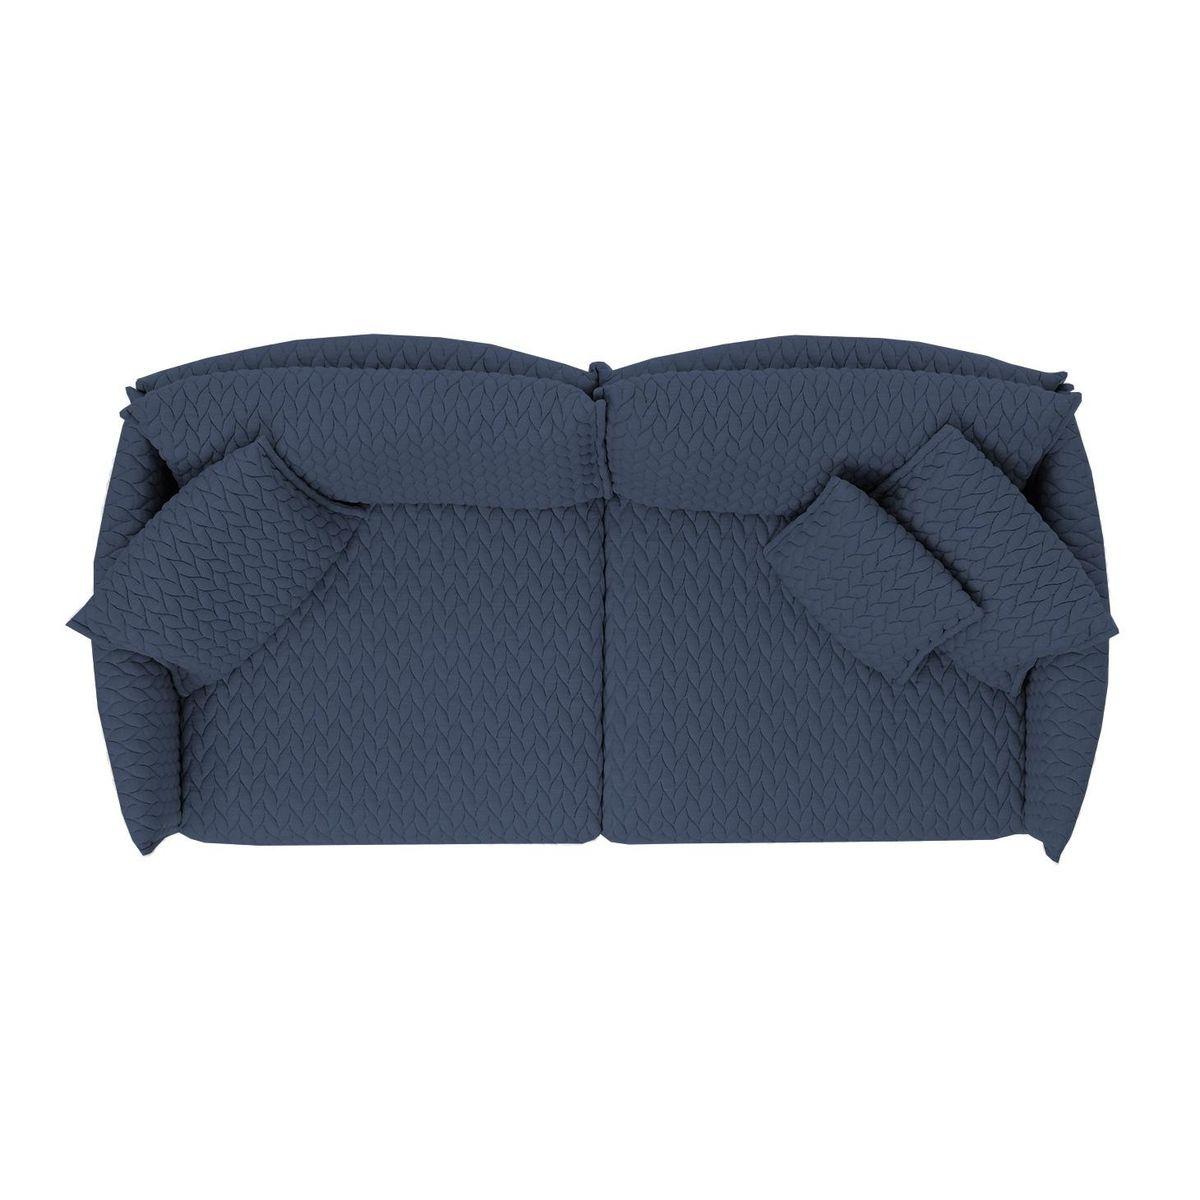 gentry 2 sitzer sofa moroso. Black Bedroom Furniture Sets. Home Design Ideas